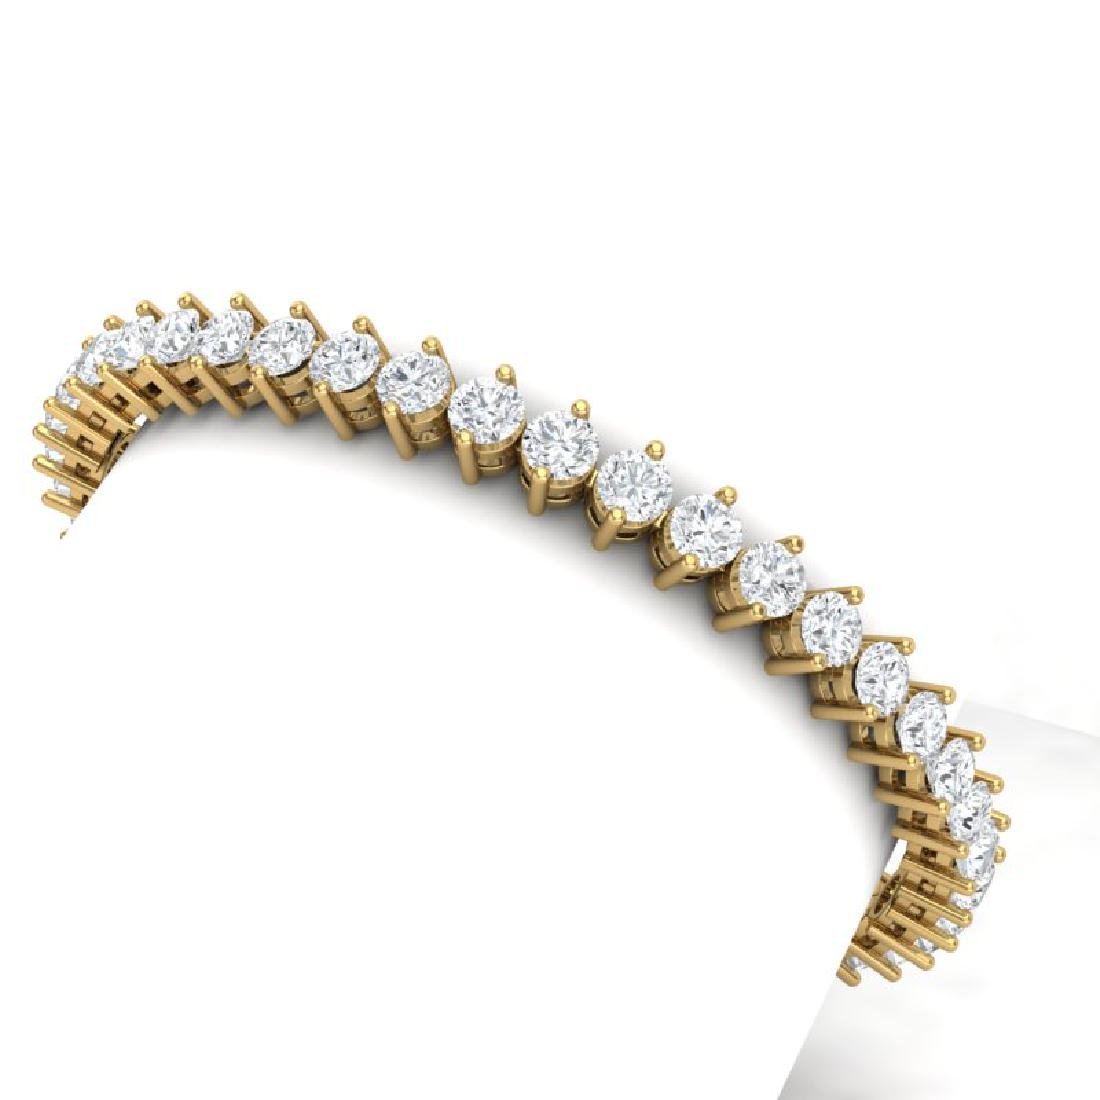 13 CTW Certified VS/SI Diamond Bracelet 18K Yellow Gold